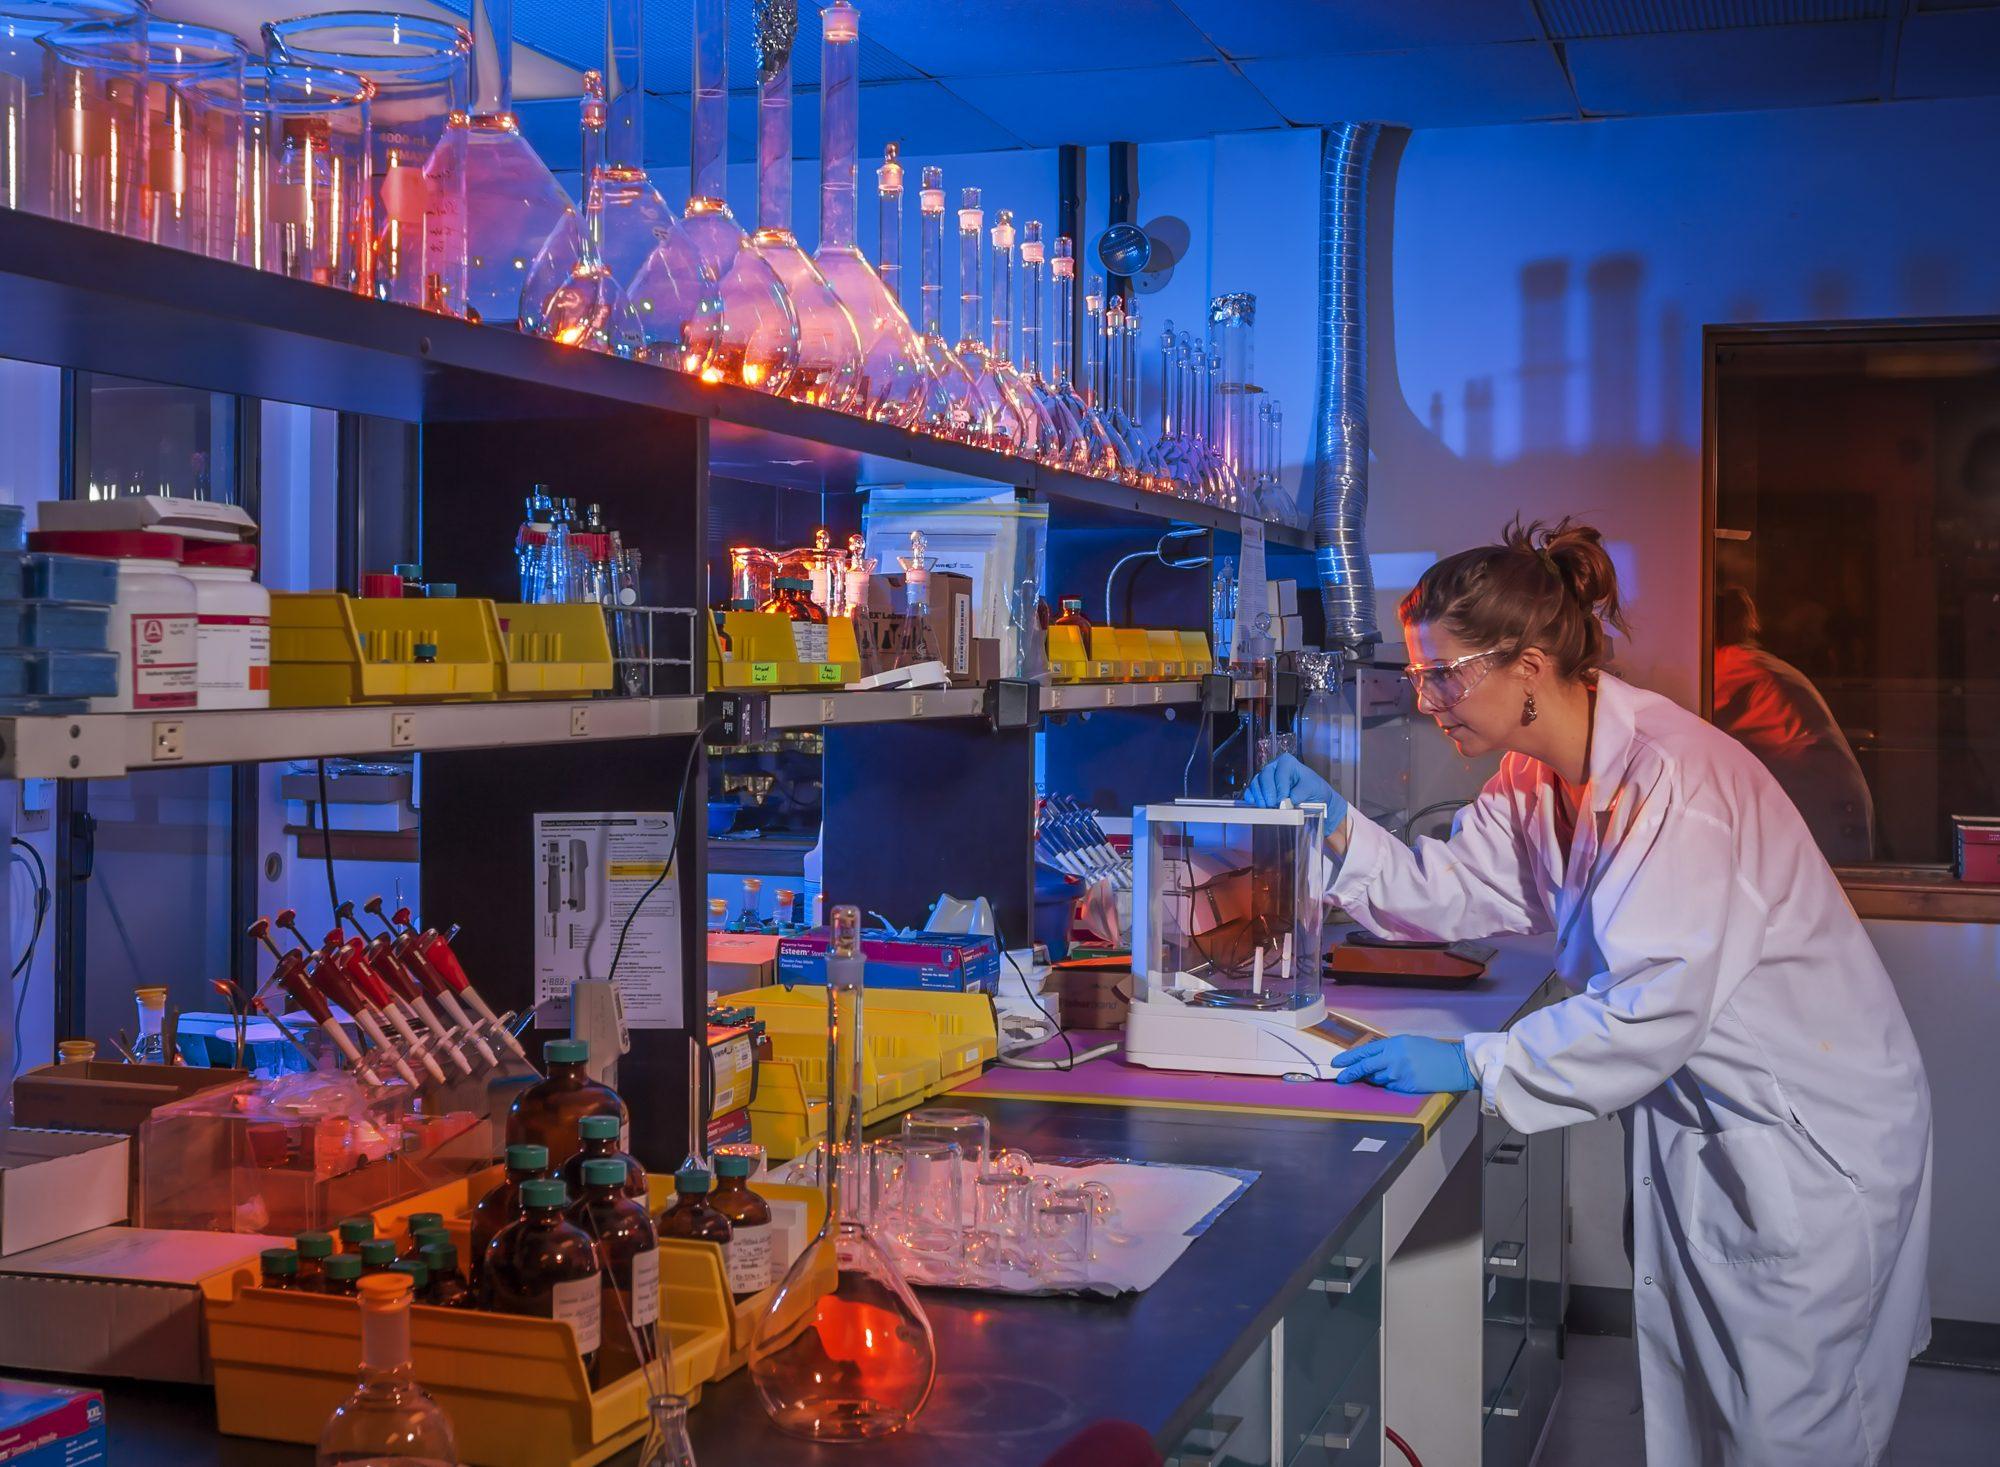 LGBTQ people in STEM, research